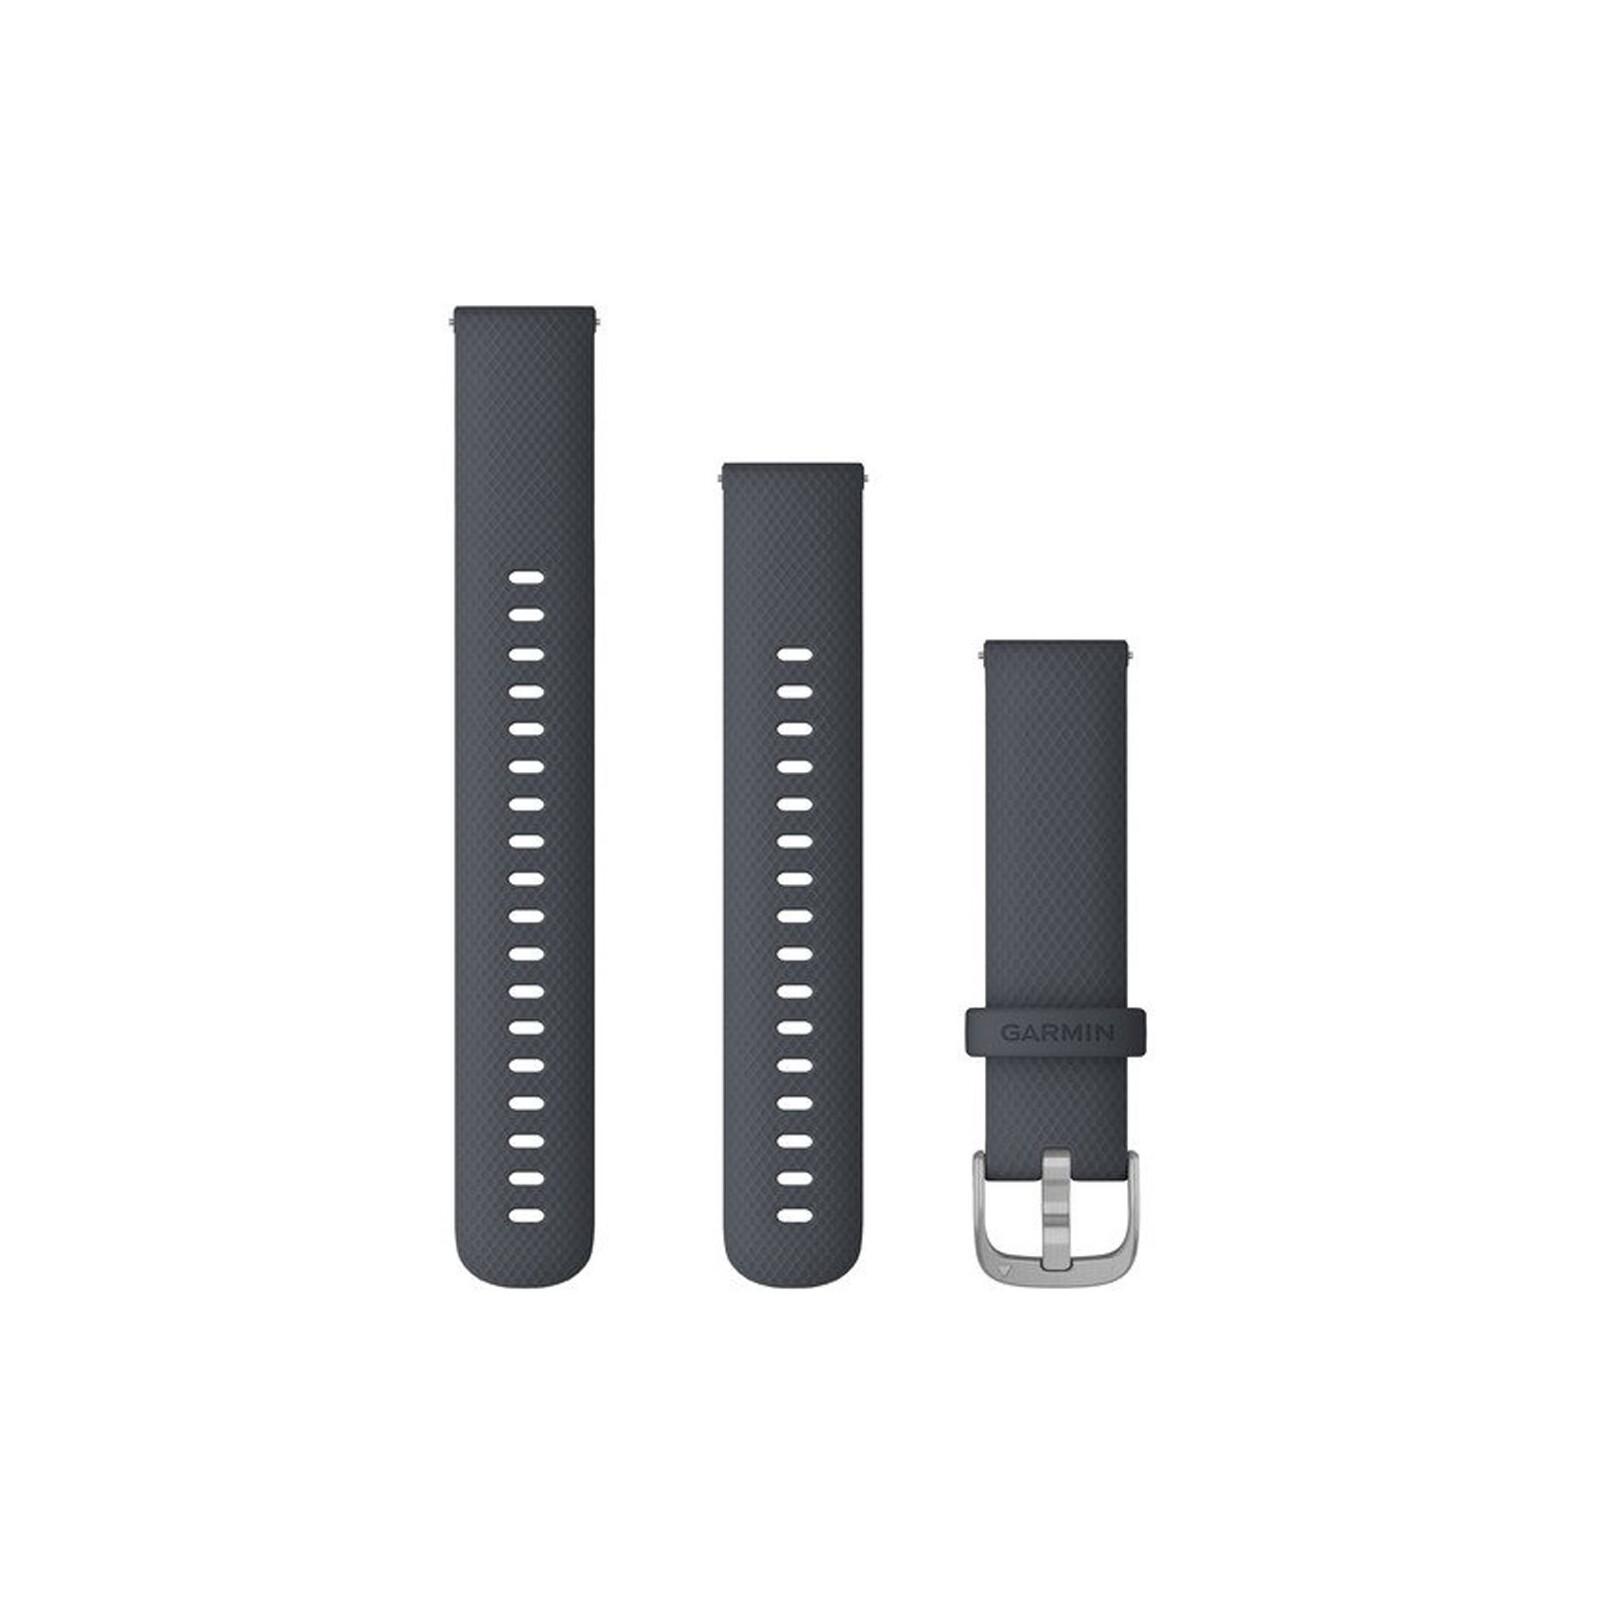 Garmin Band 18mm Silikon granitblau silber